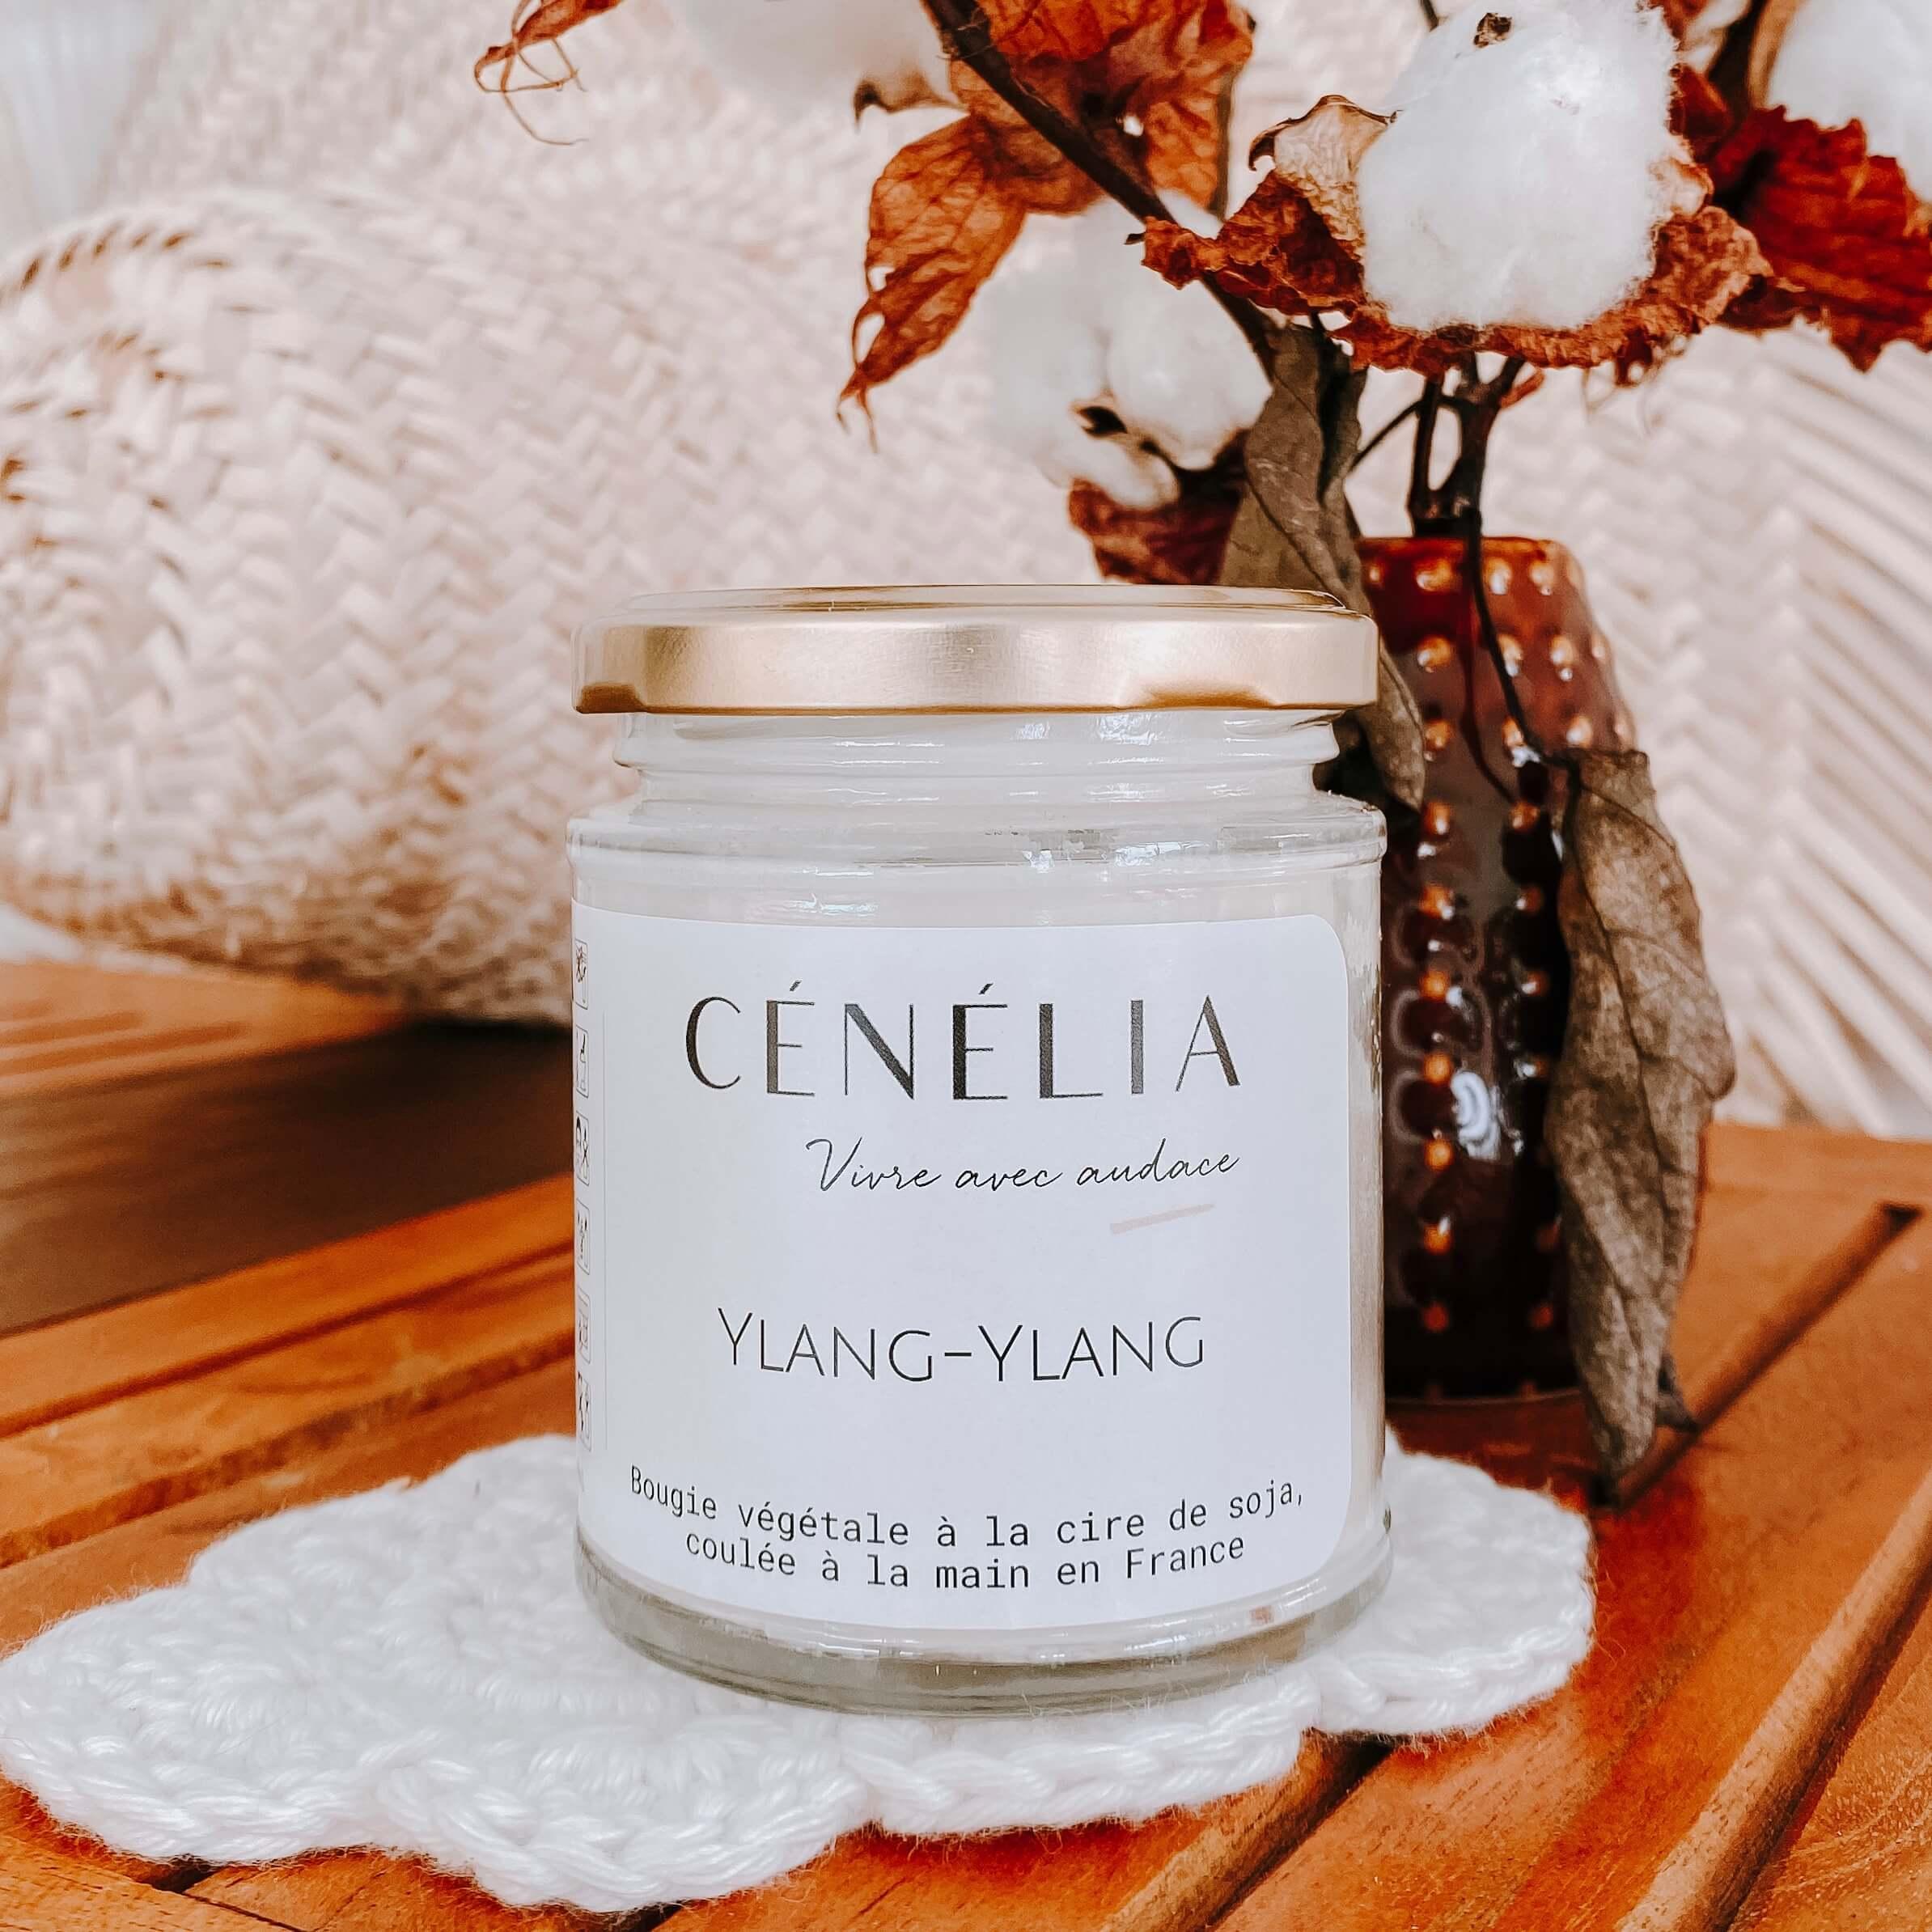 bougie exotique - bougie Ylang-Ylang Cénélia